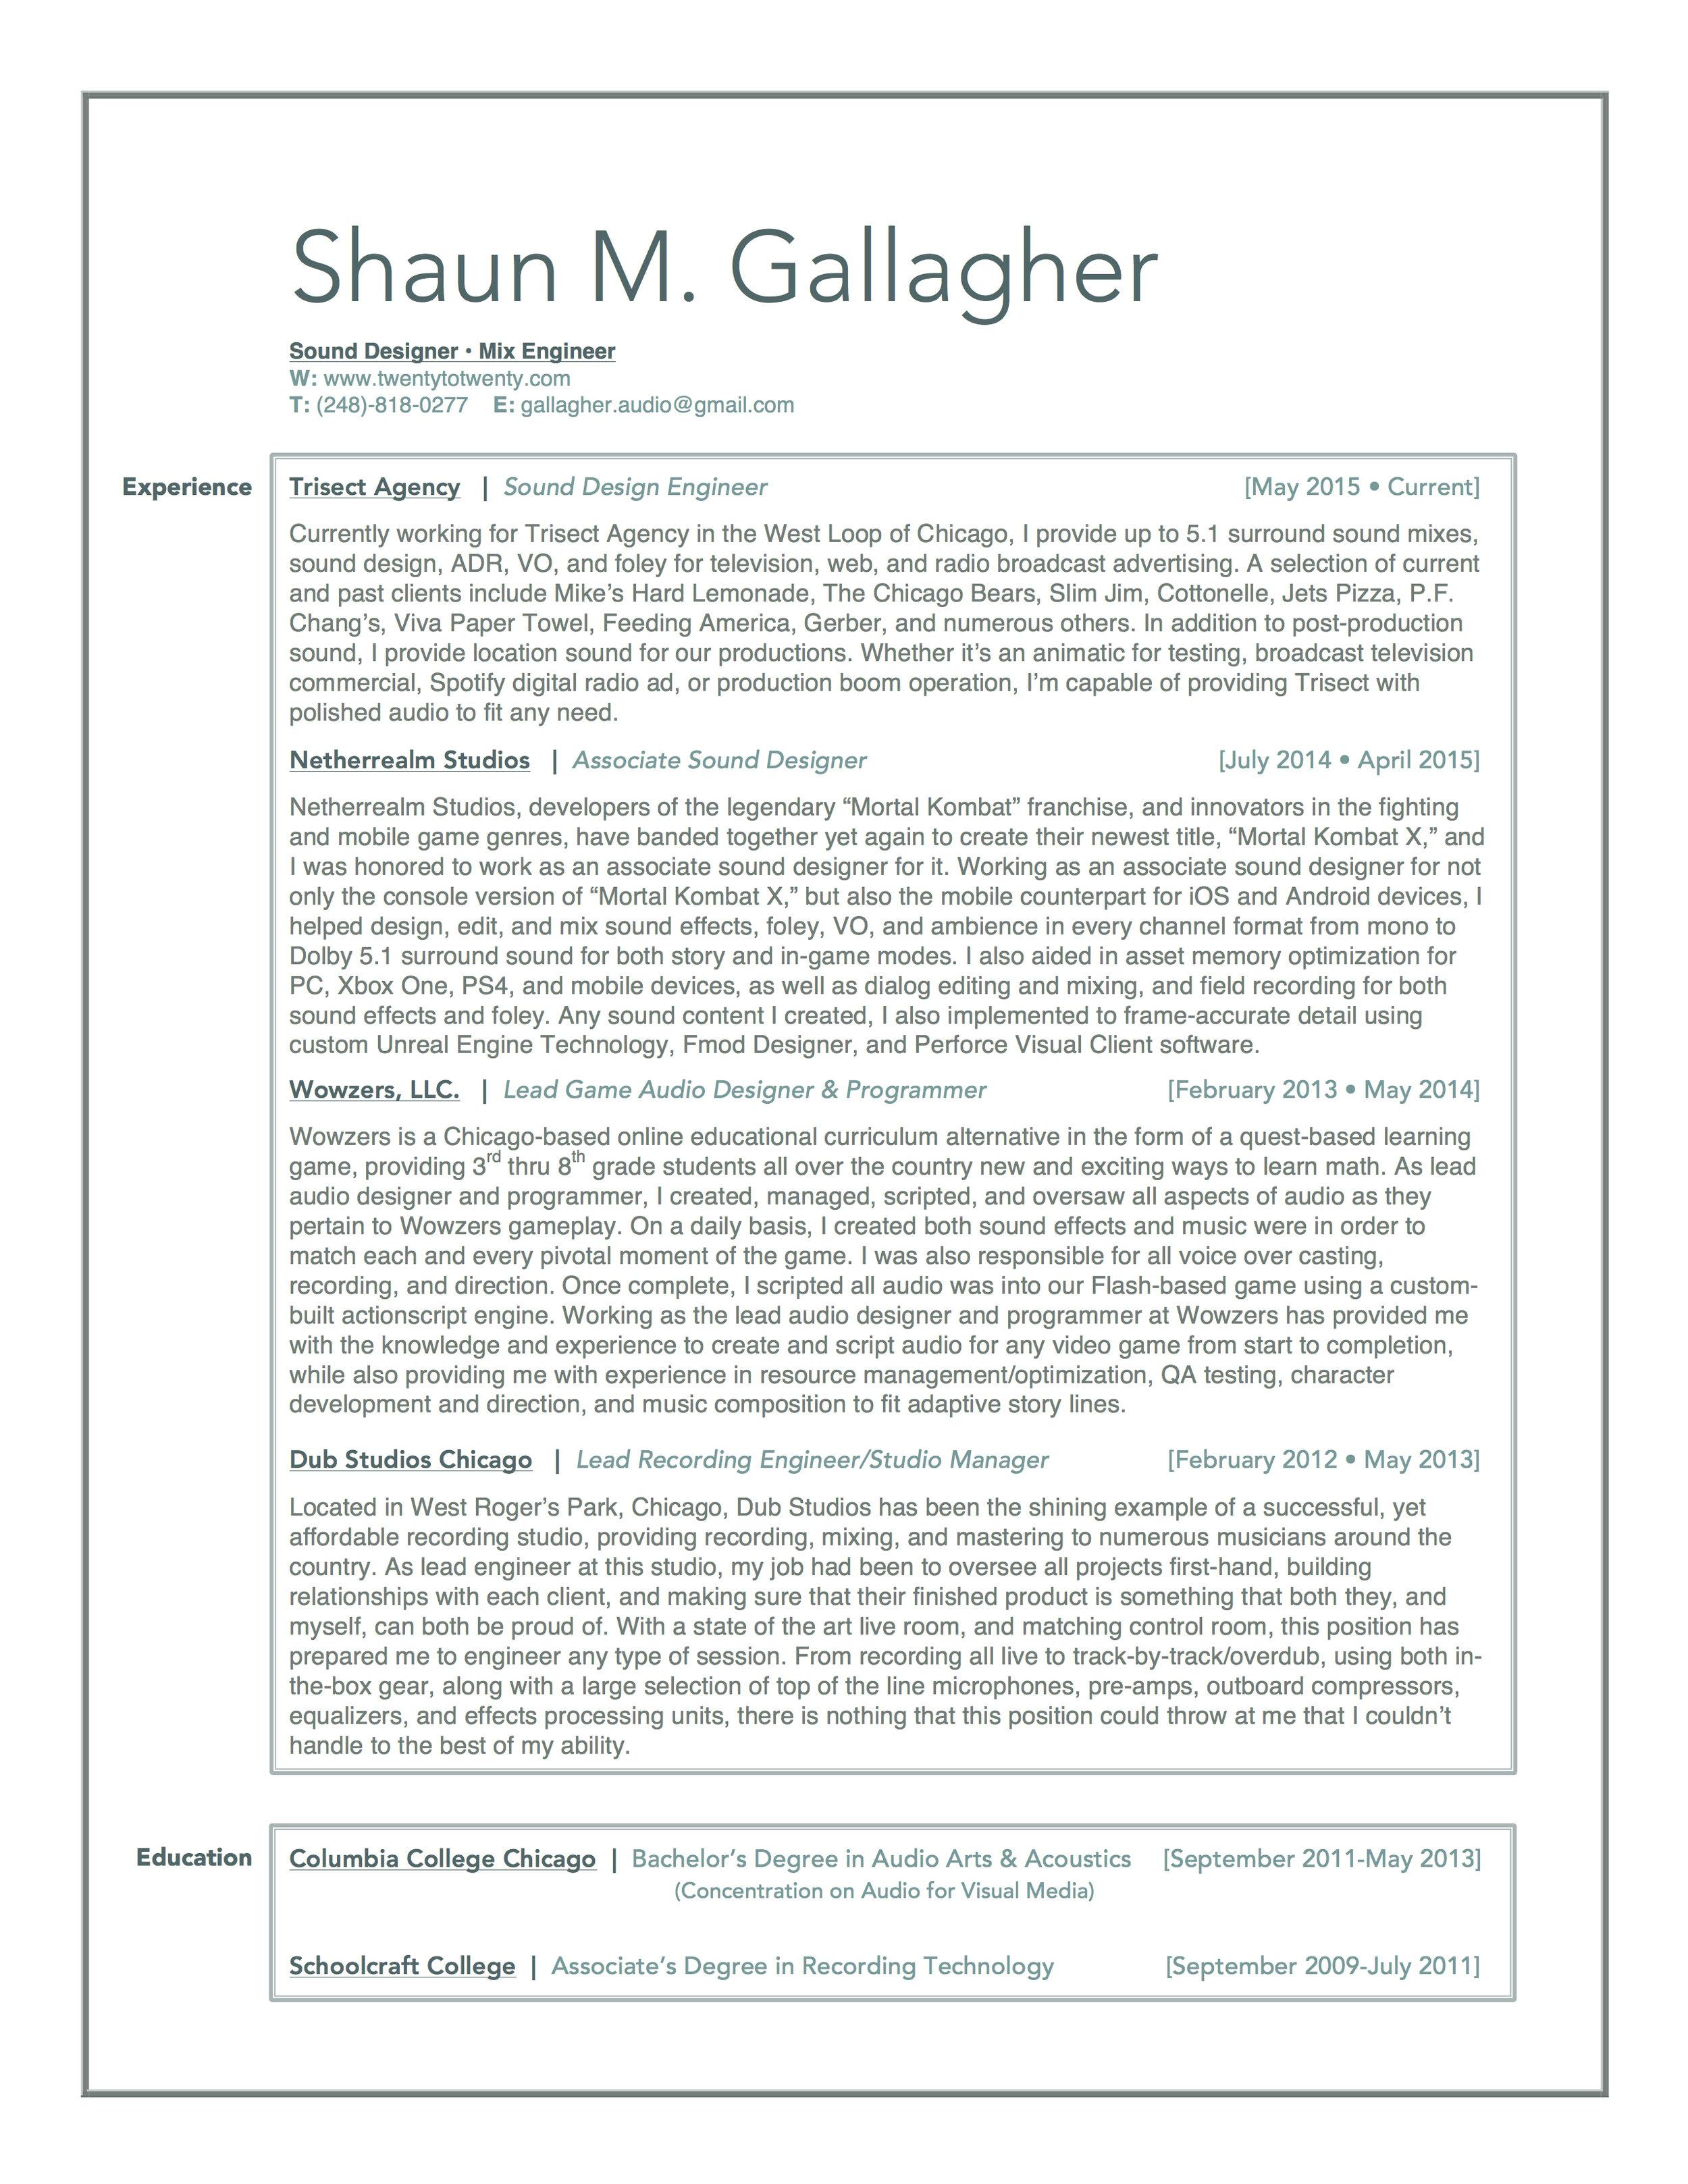 Shaun_Gallagher_Resume_PG01.jpg